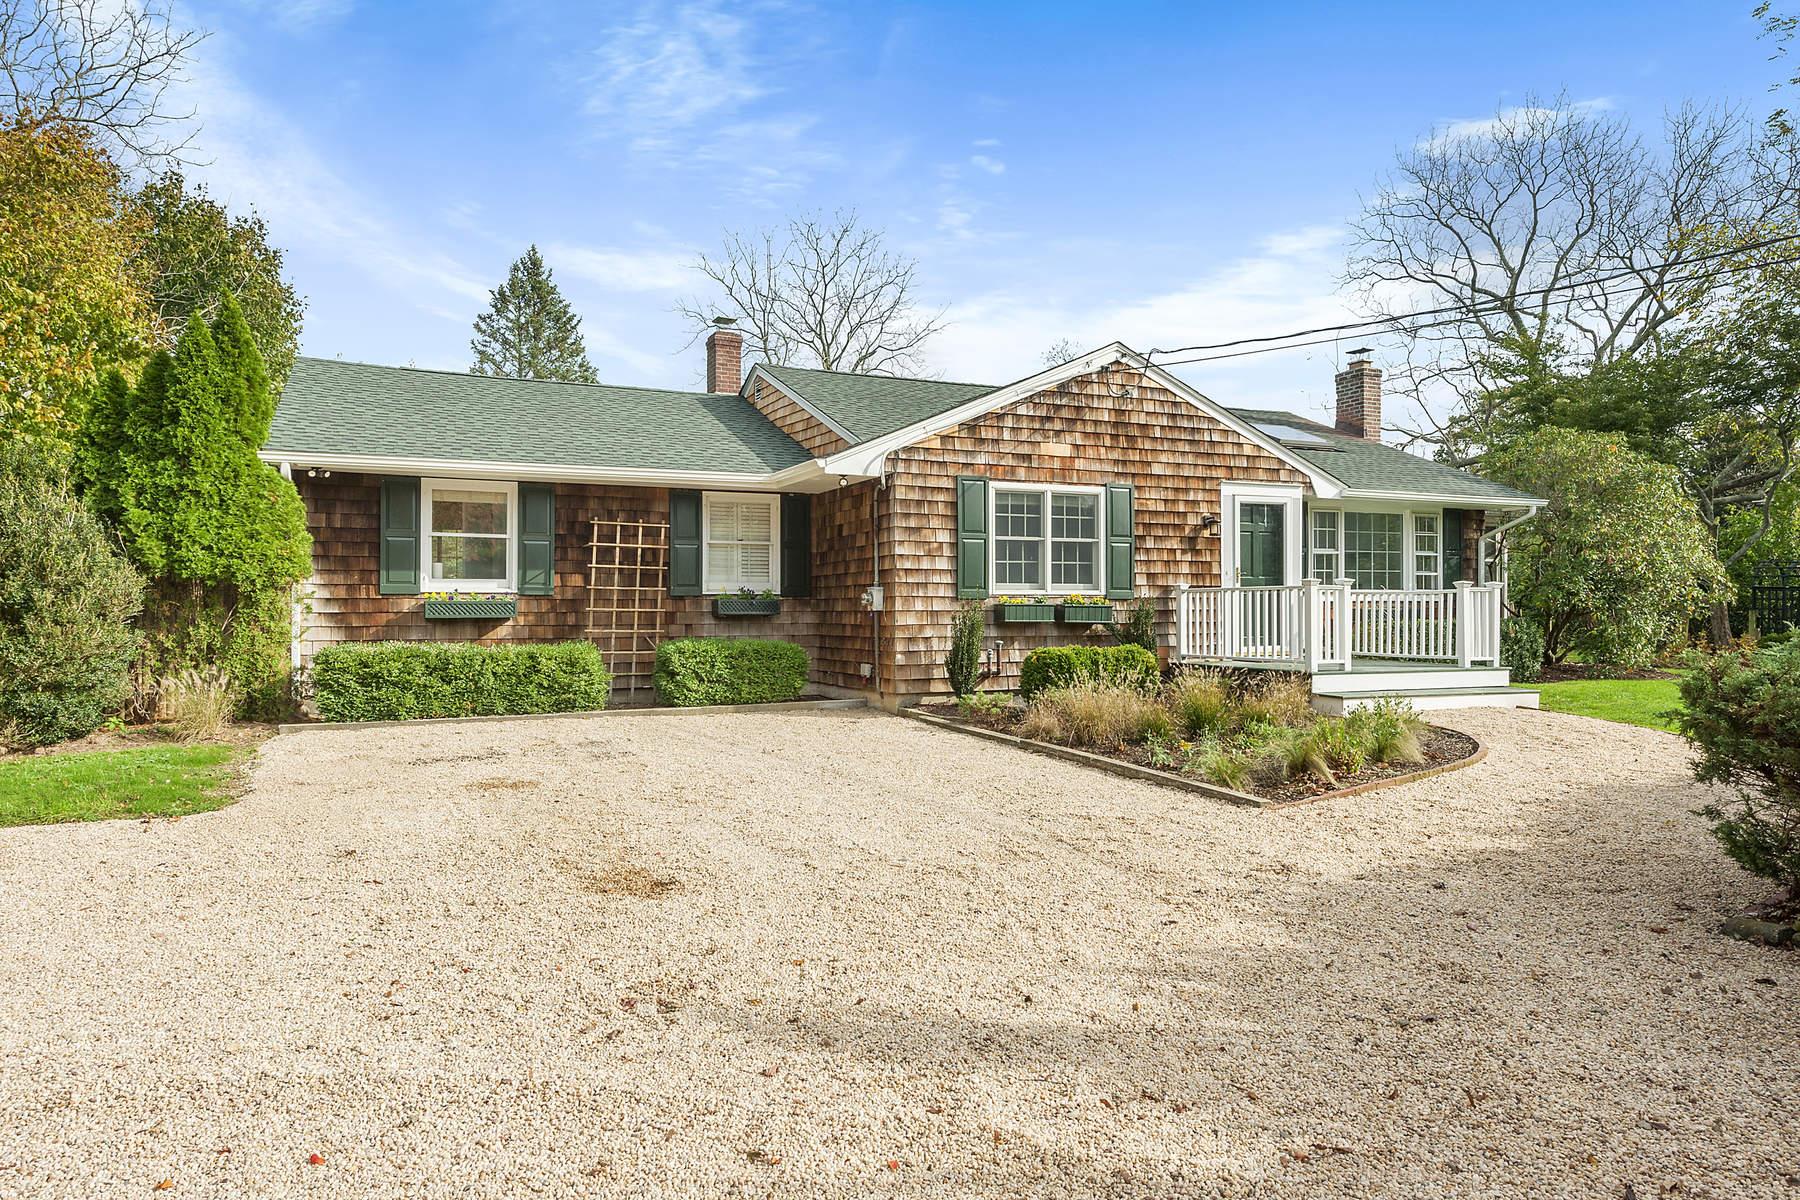 獨棟家庭住宅 為 出售 在 Water Mill South Newly Renovated 158 Cobb Road, Water Mill, 紐約州, 11976 美國